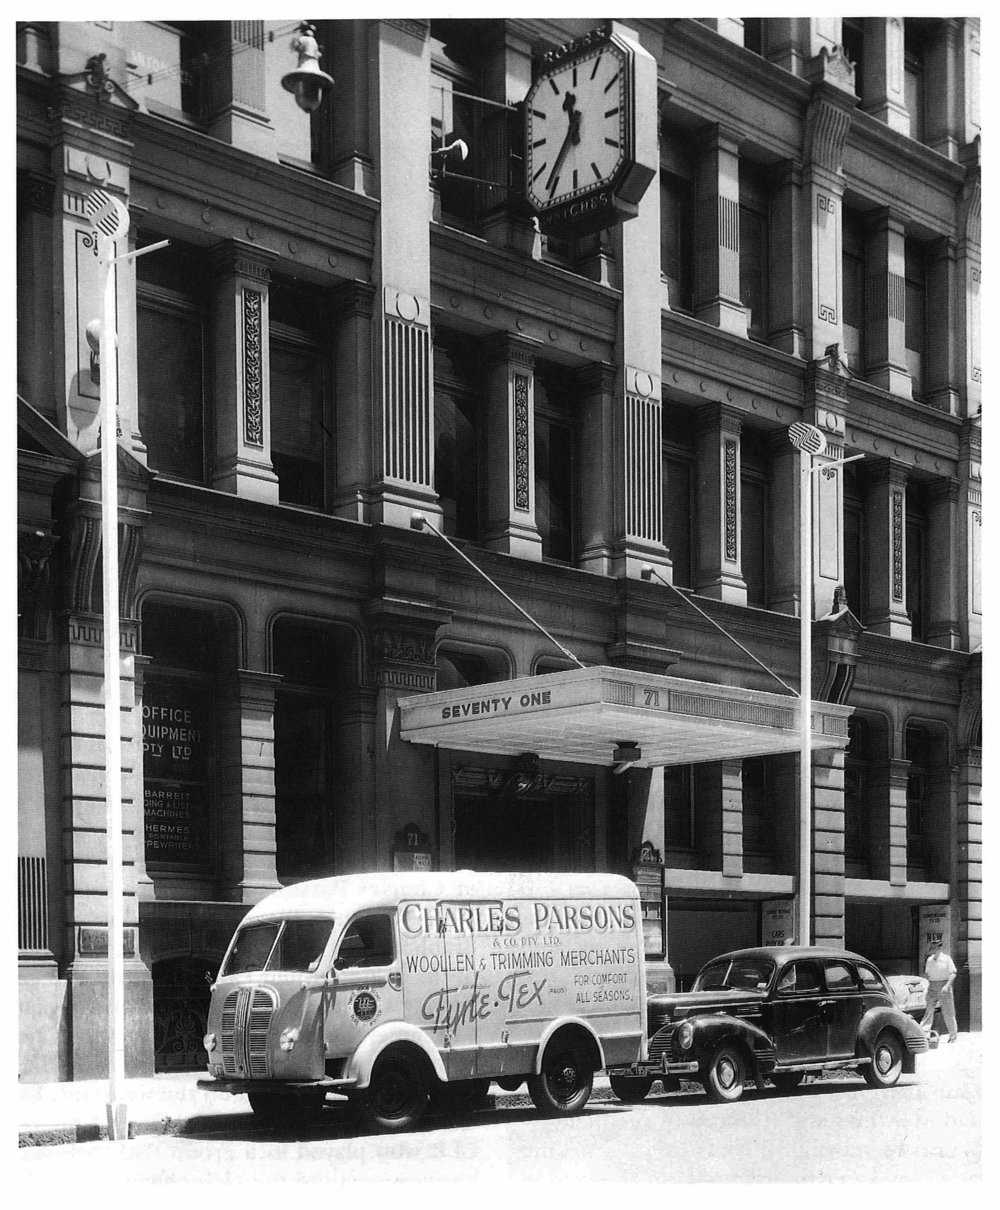 Charles Parsons York St + Van_circa 1946 (Image 2).jpg